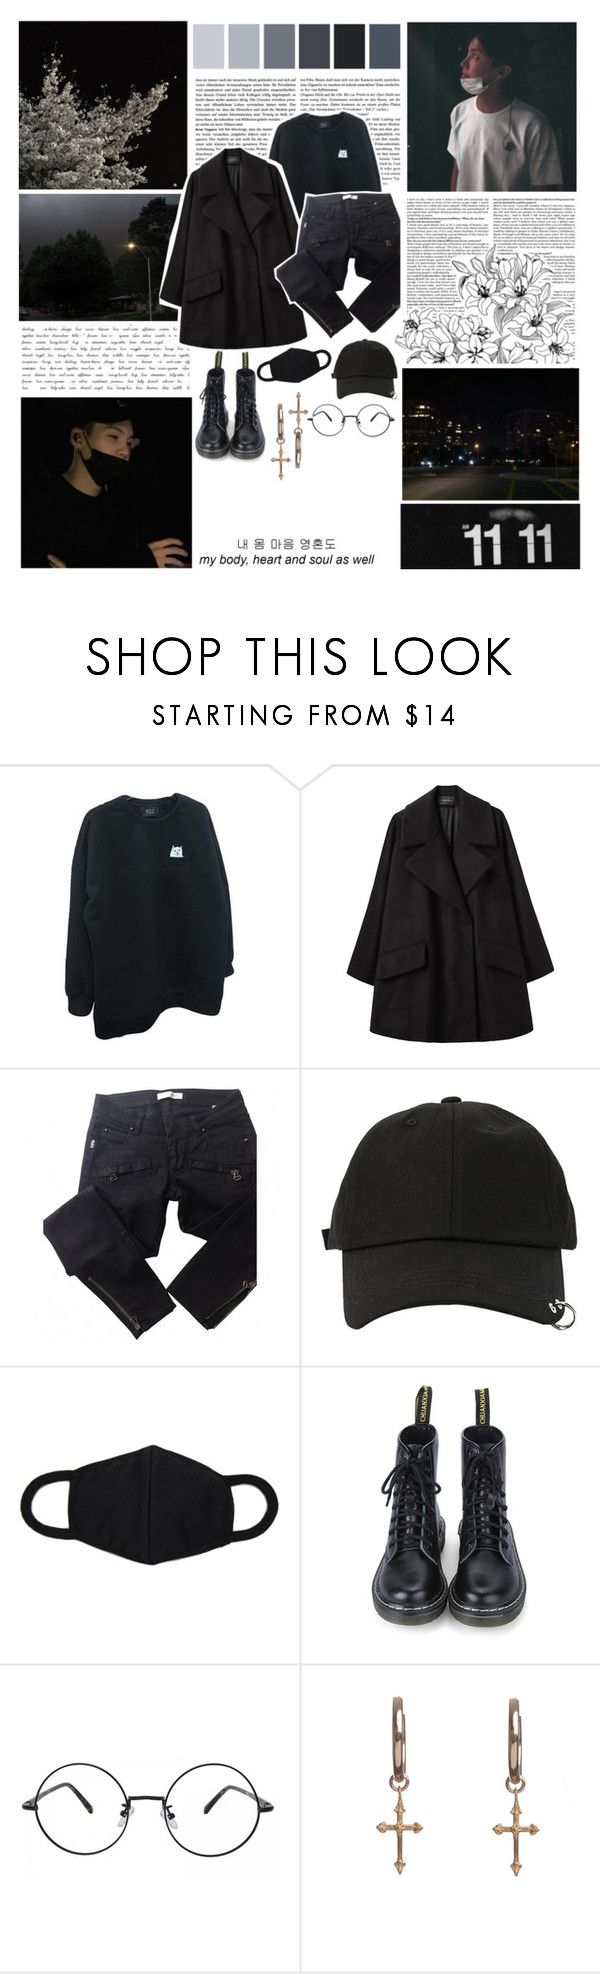 """O48: 쉬고 싶지 않아 // 아니 조금만 쉬면 어때"" by yoongi-btm ❤ liked on Polyvore featuring GET LOST, ...Lost, Simone Rocha, Balmain, StyleNanda, Rachel Entwistle, men's fashion and menswear"